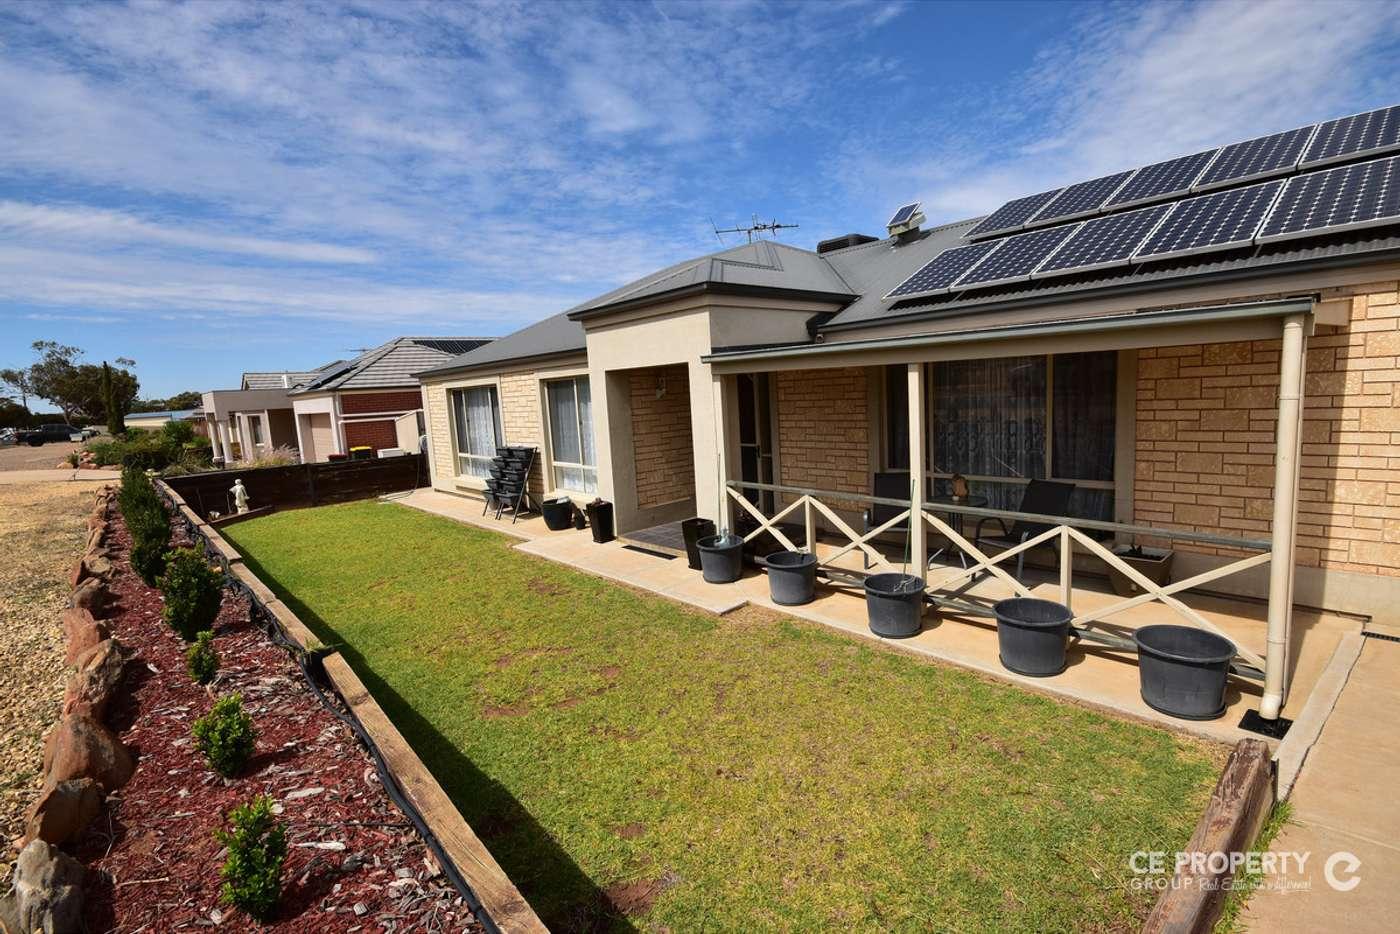 Main view of Homely house listing, 72 Sickerdick Street, Mannum SA 5238